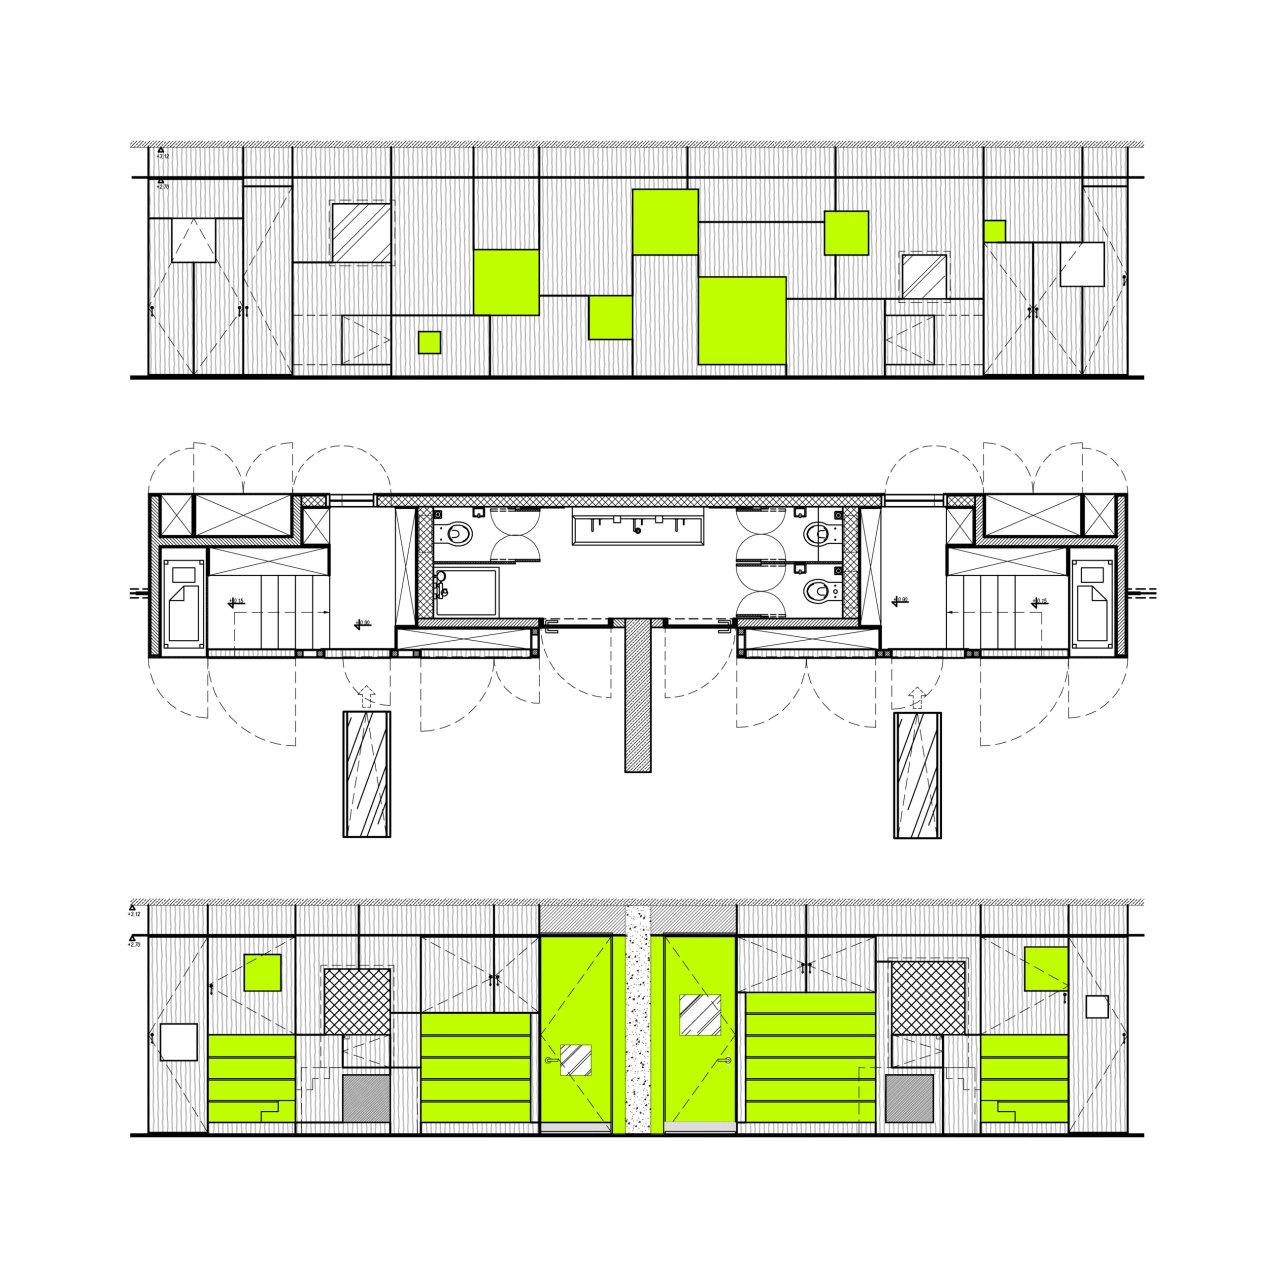 ultra-architects-allegro-pxl-pixel-piksel-wnetrza-przedszkole-szafa-1280x1280